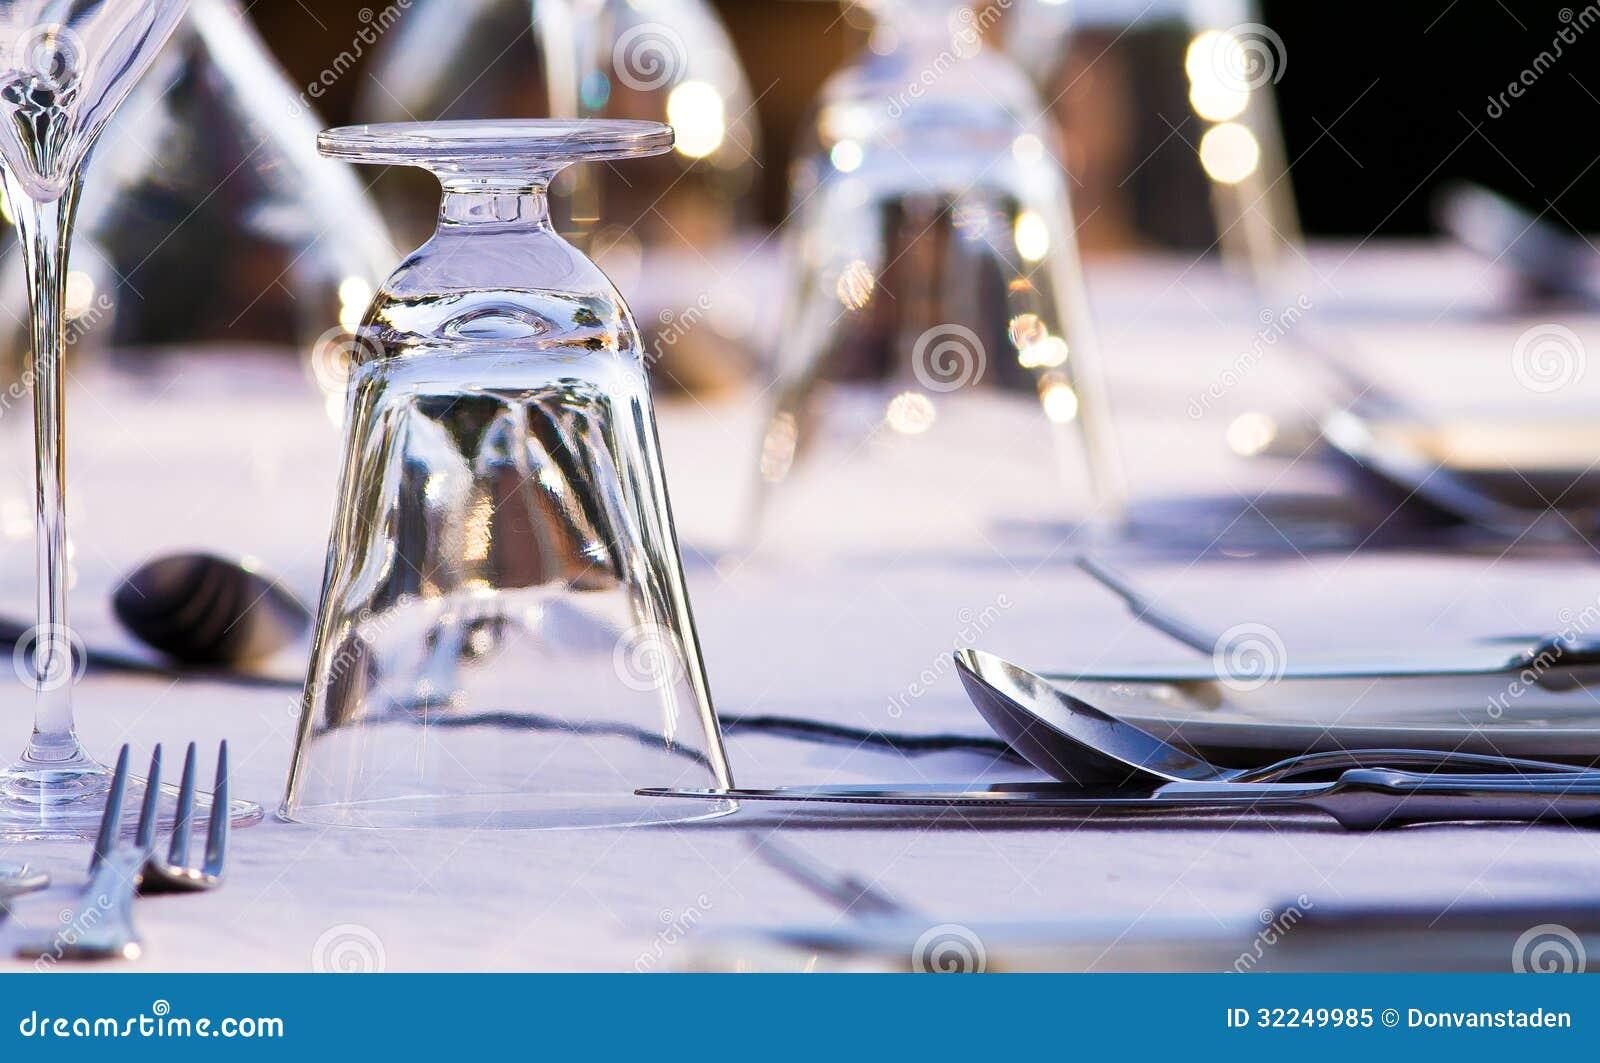 Elegant Restaurant Table Setting Royalty Free Stock Photo  : elegant restaurant table setting beautifull glasses cutlery 32249985 from www.dreamstime.com size 1300 x 880 jpeg 135kB